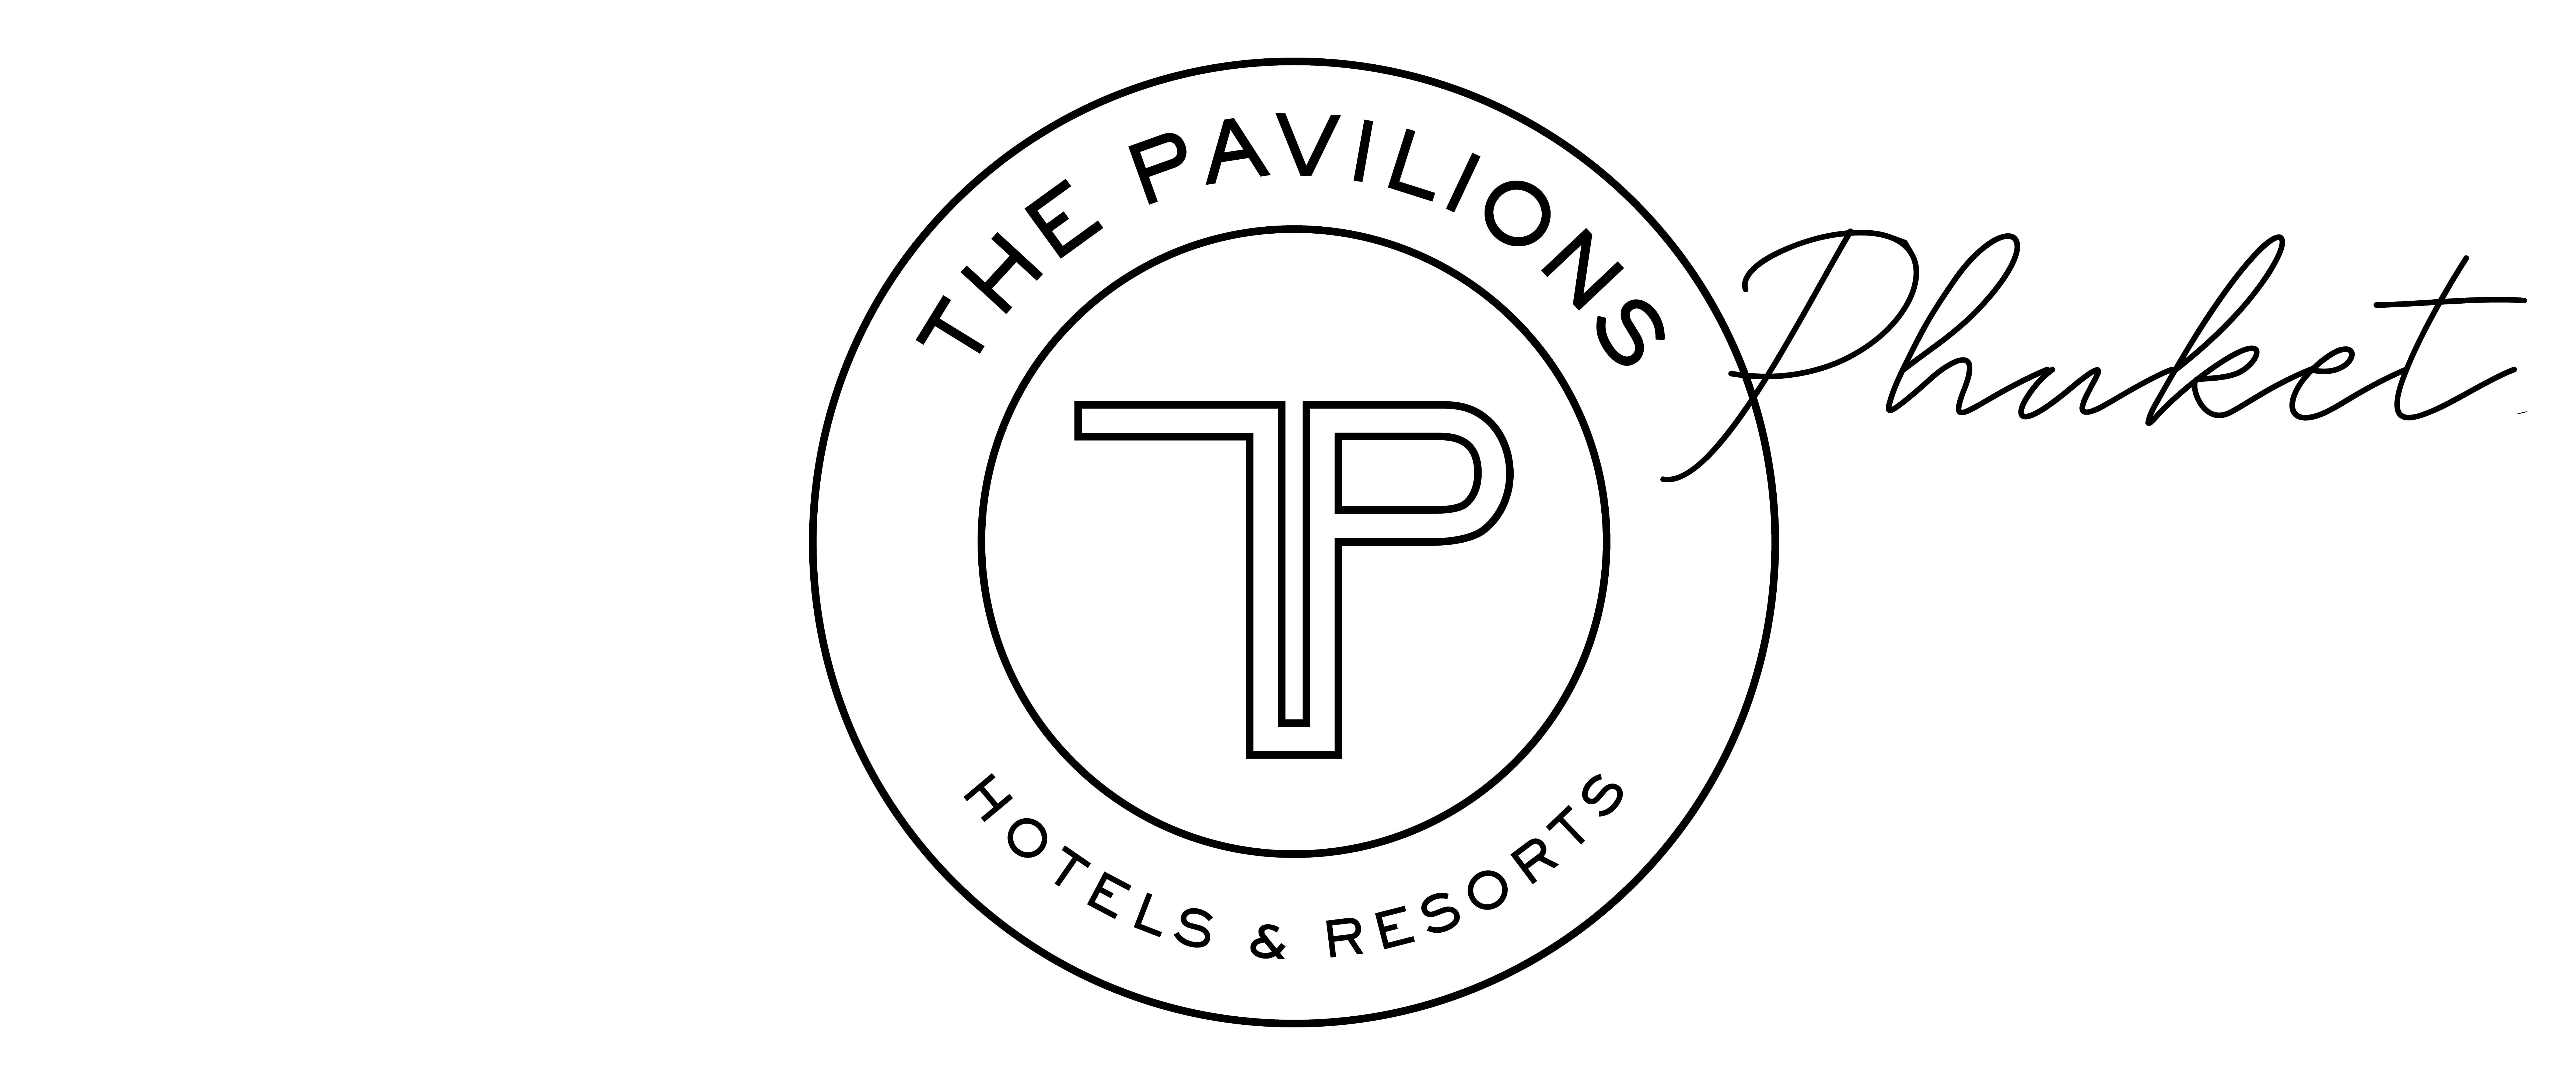 The Pavilions - Phuket